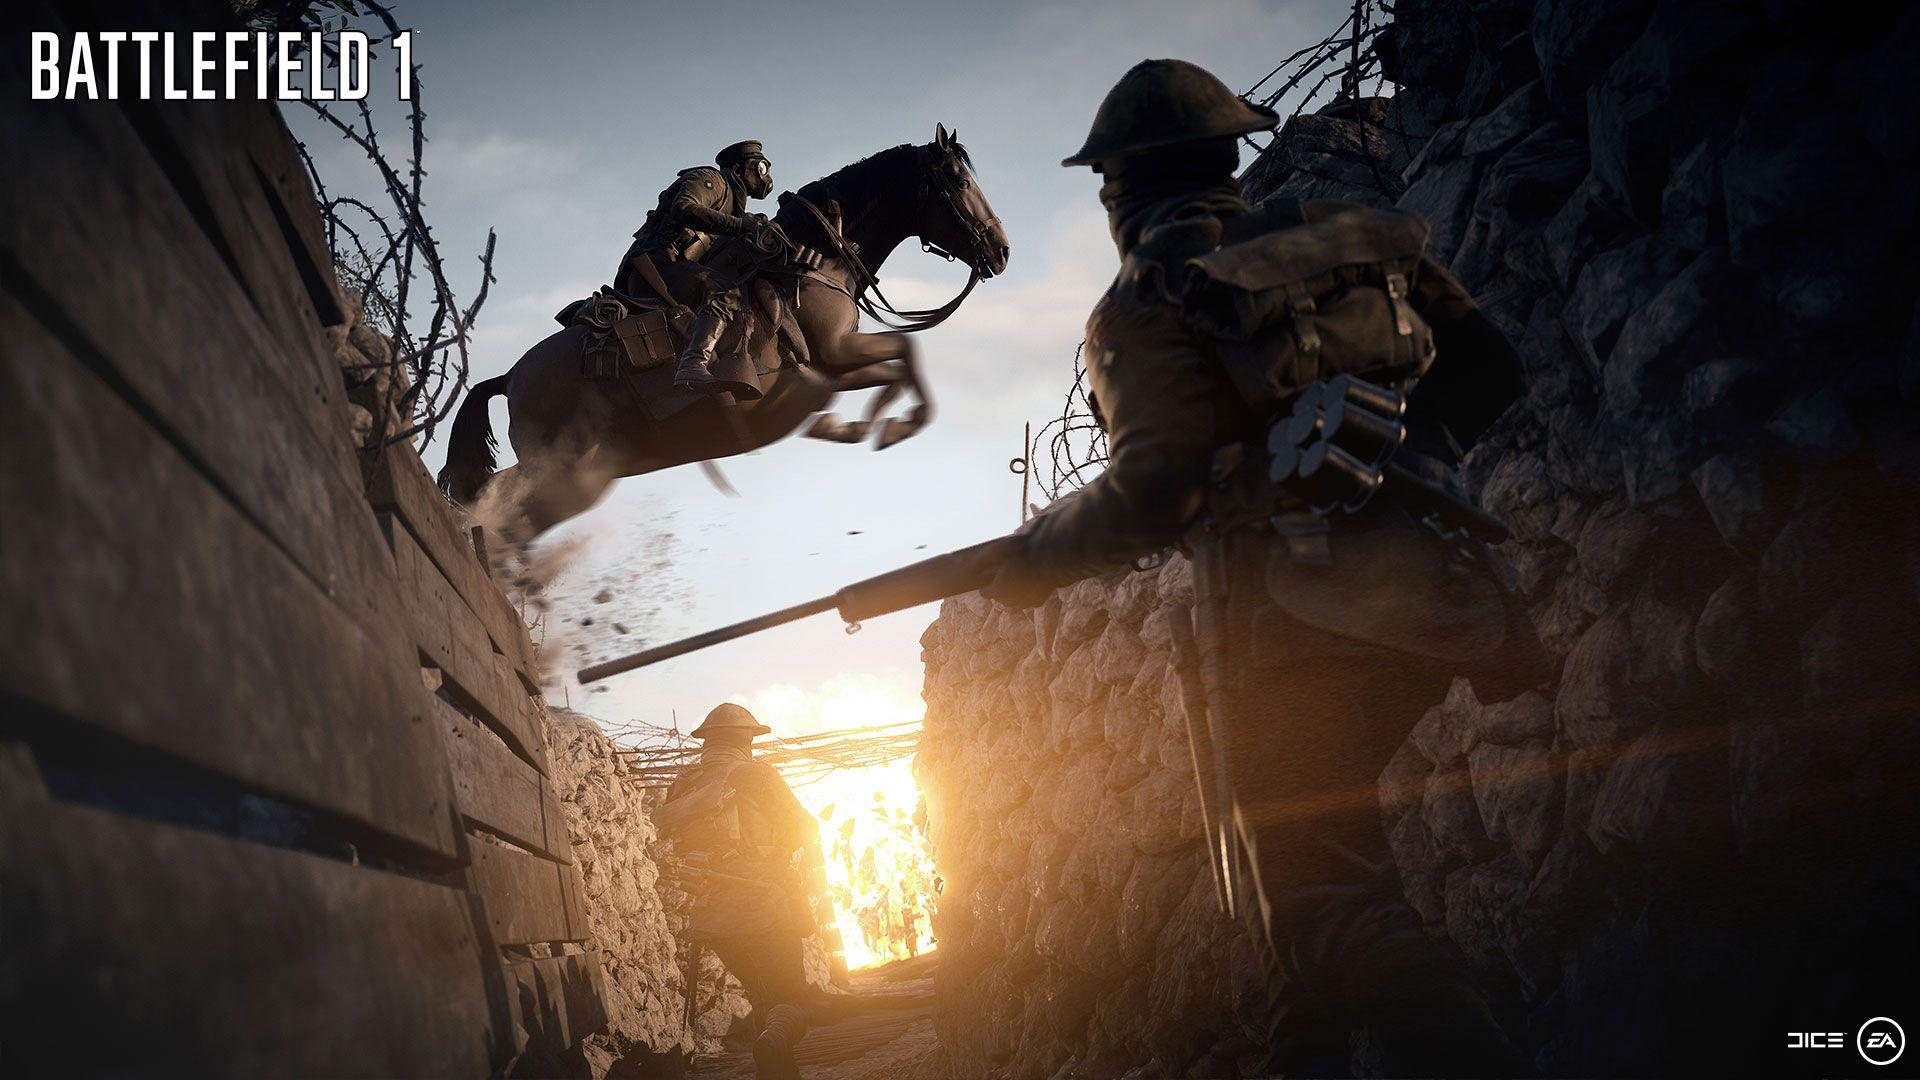 Battlefield 1 delivers tide-turning behemoth vehicles, procedural weather   Polygon